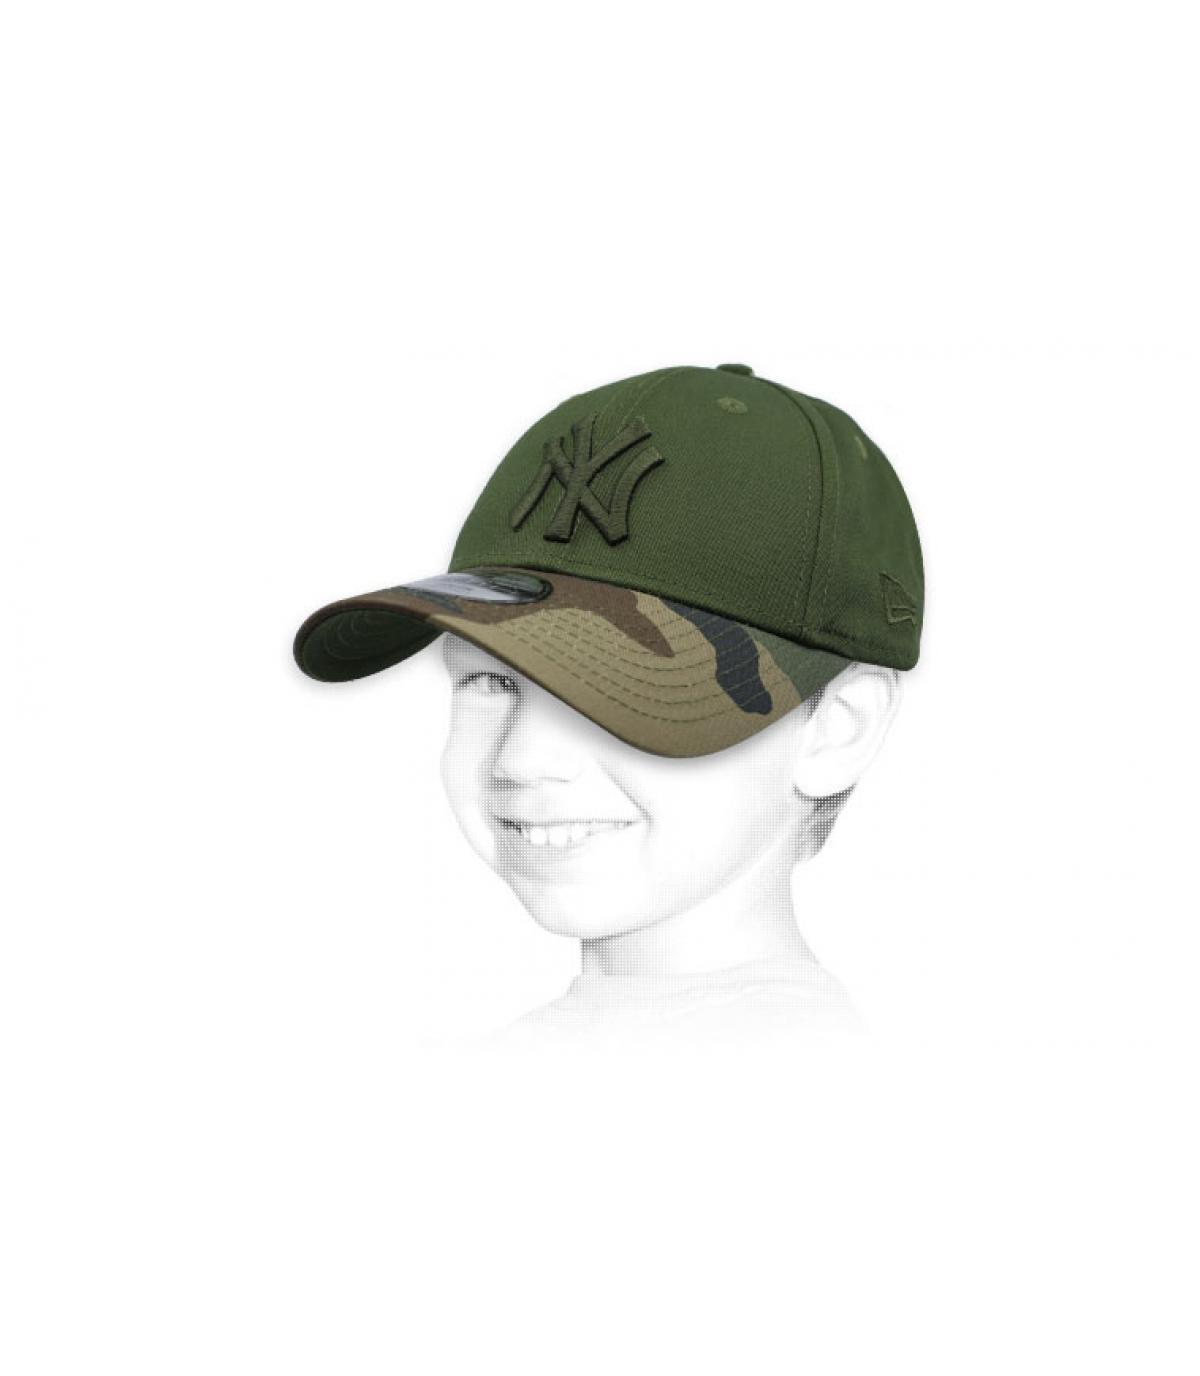 casquette NY enfant vert camo